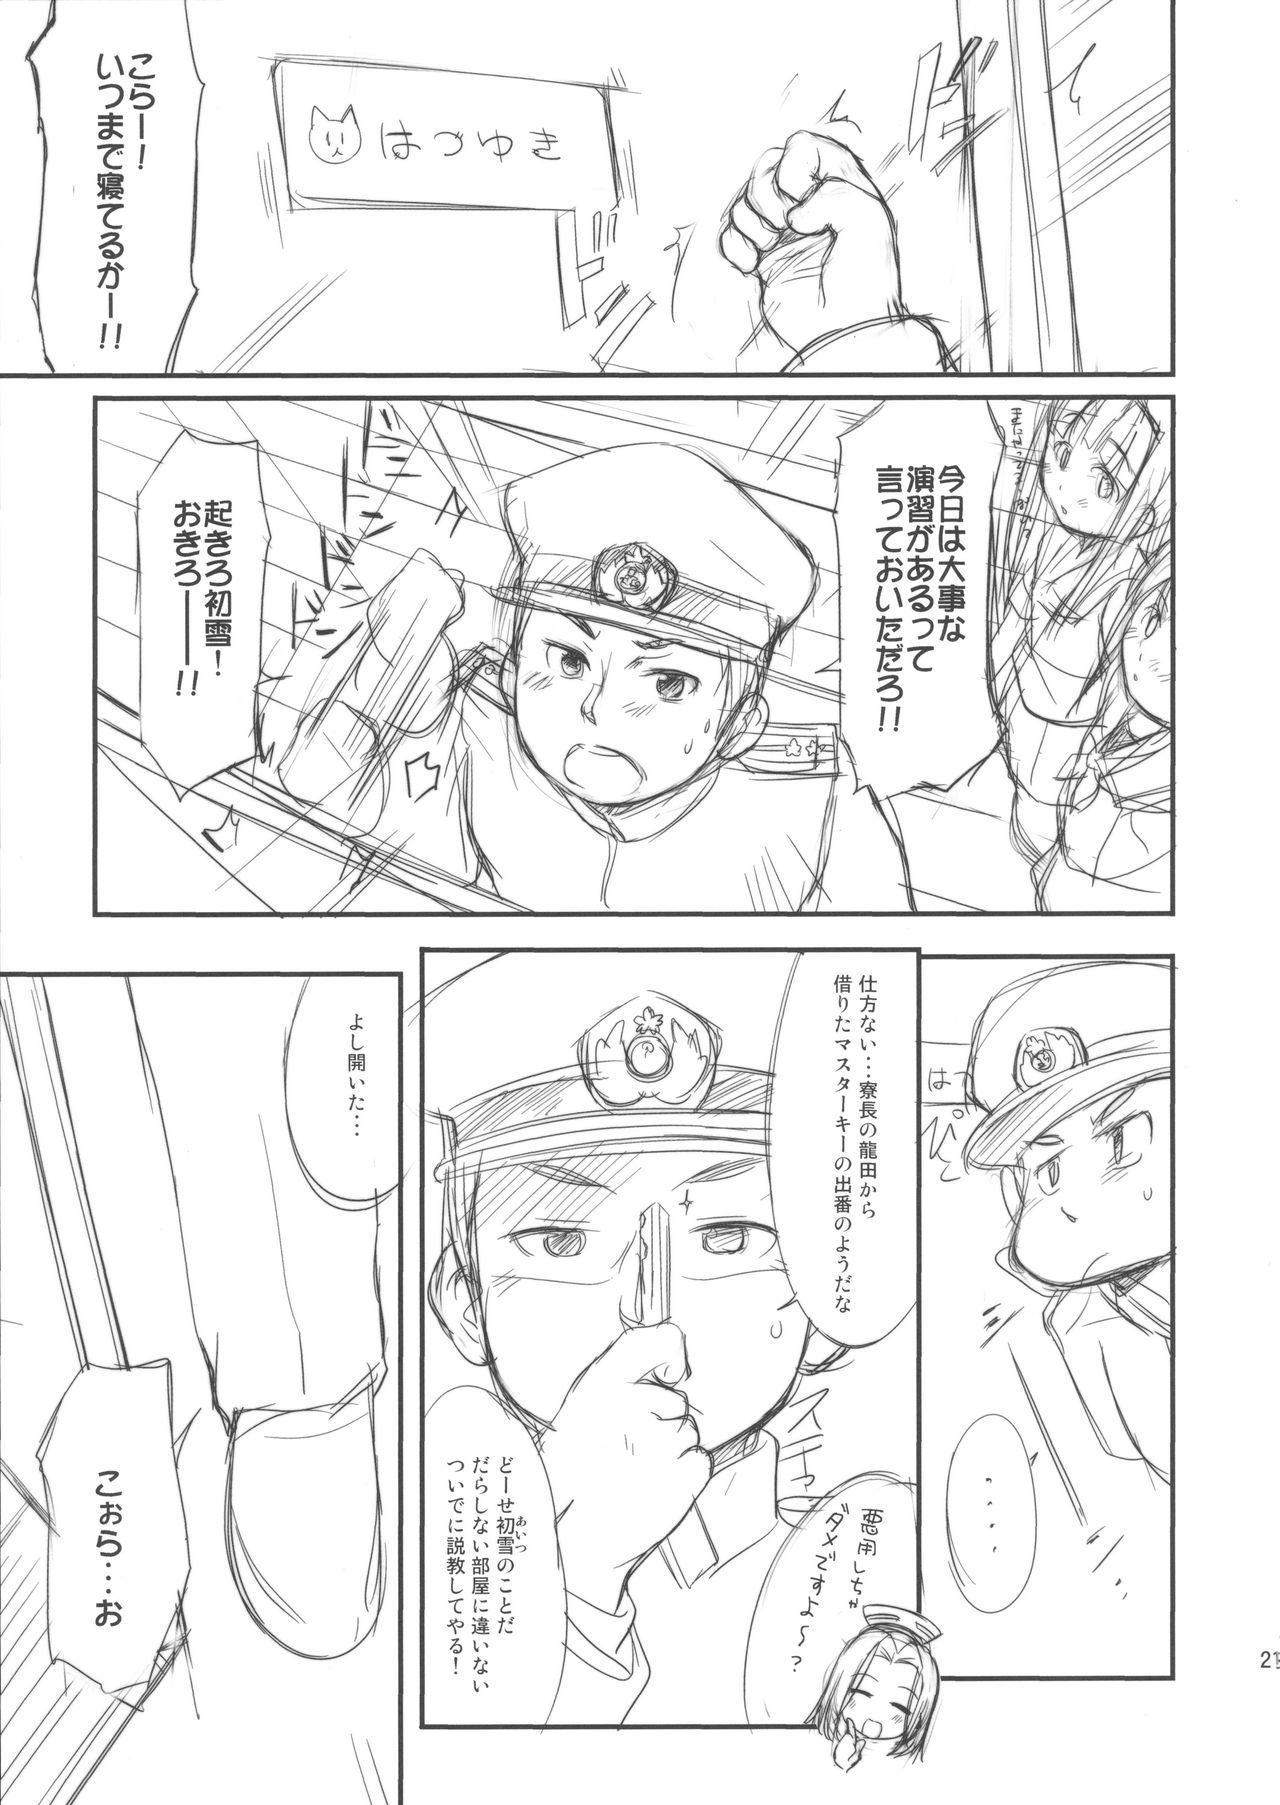 Kuchukukan Hachuyuki Monogatari 20